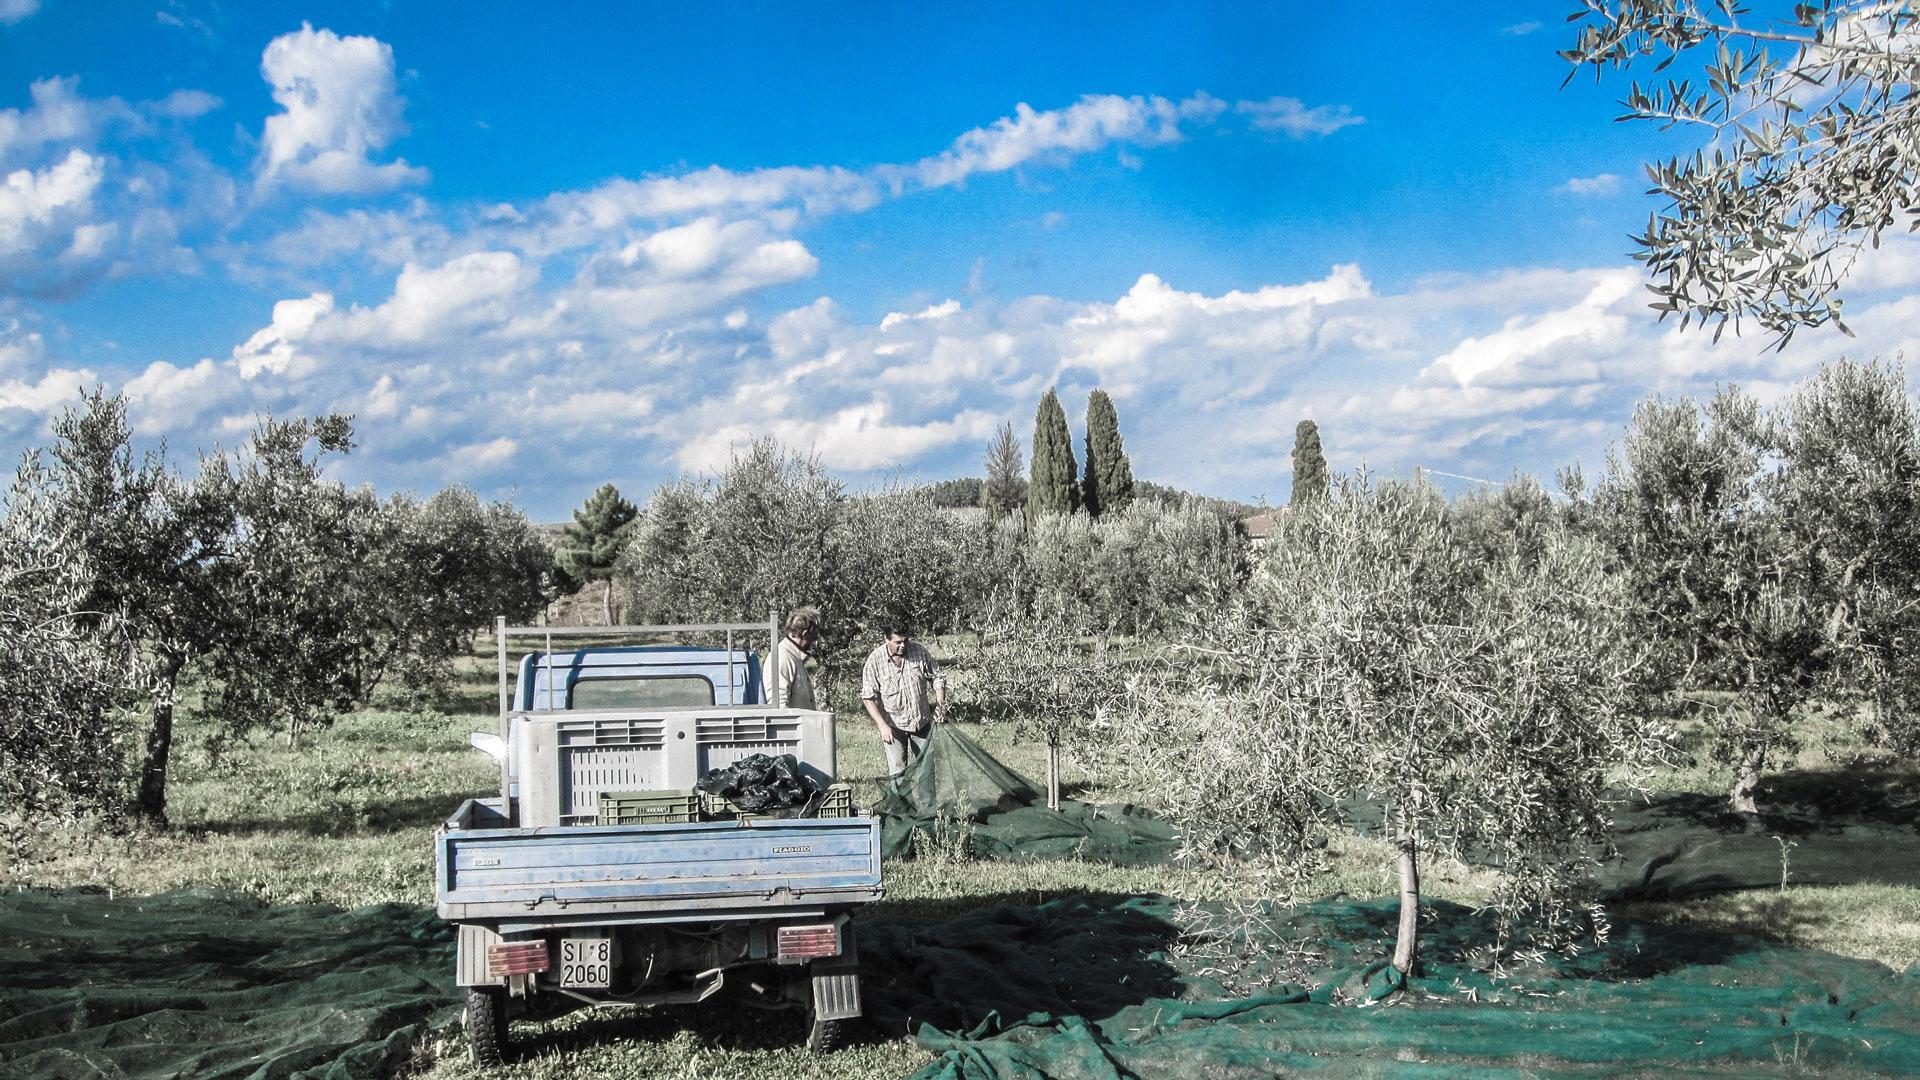 Official olive transport during the harvest!